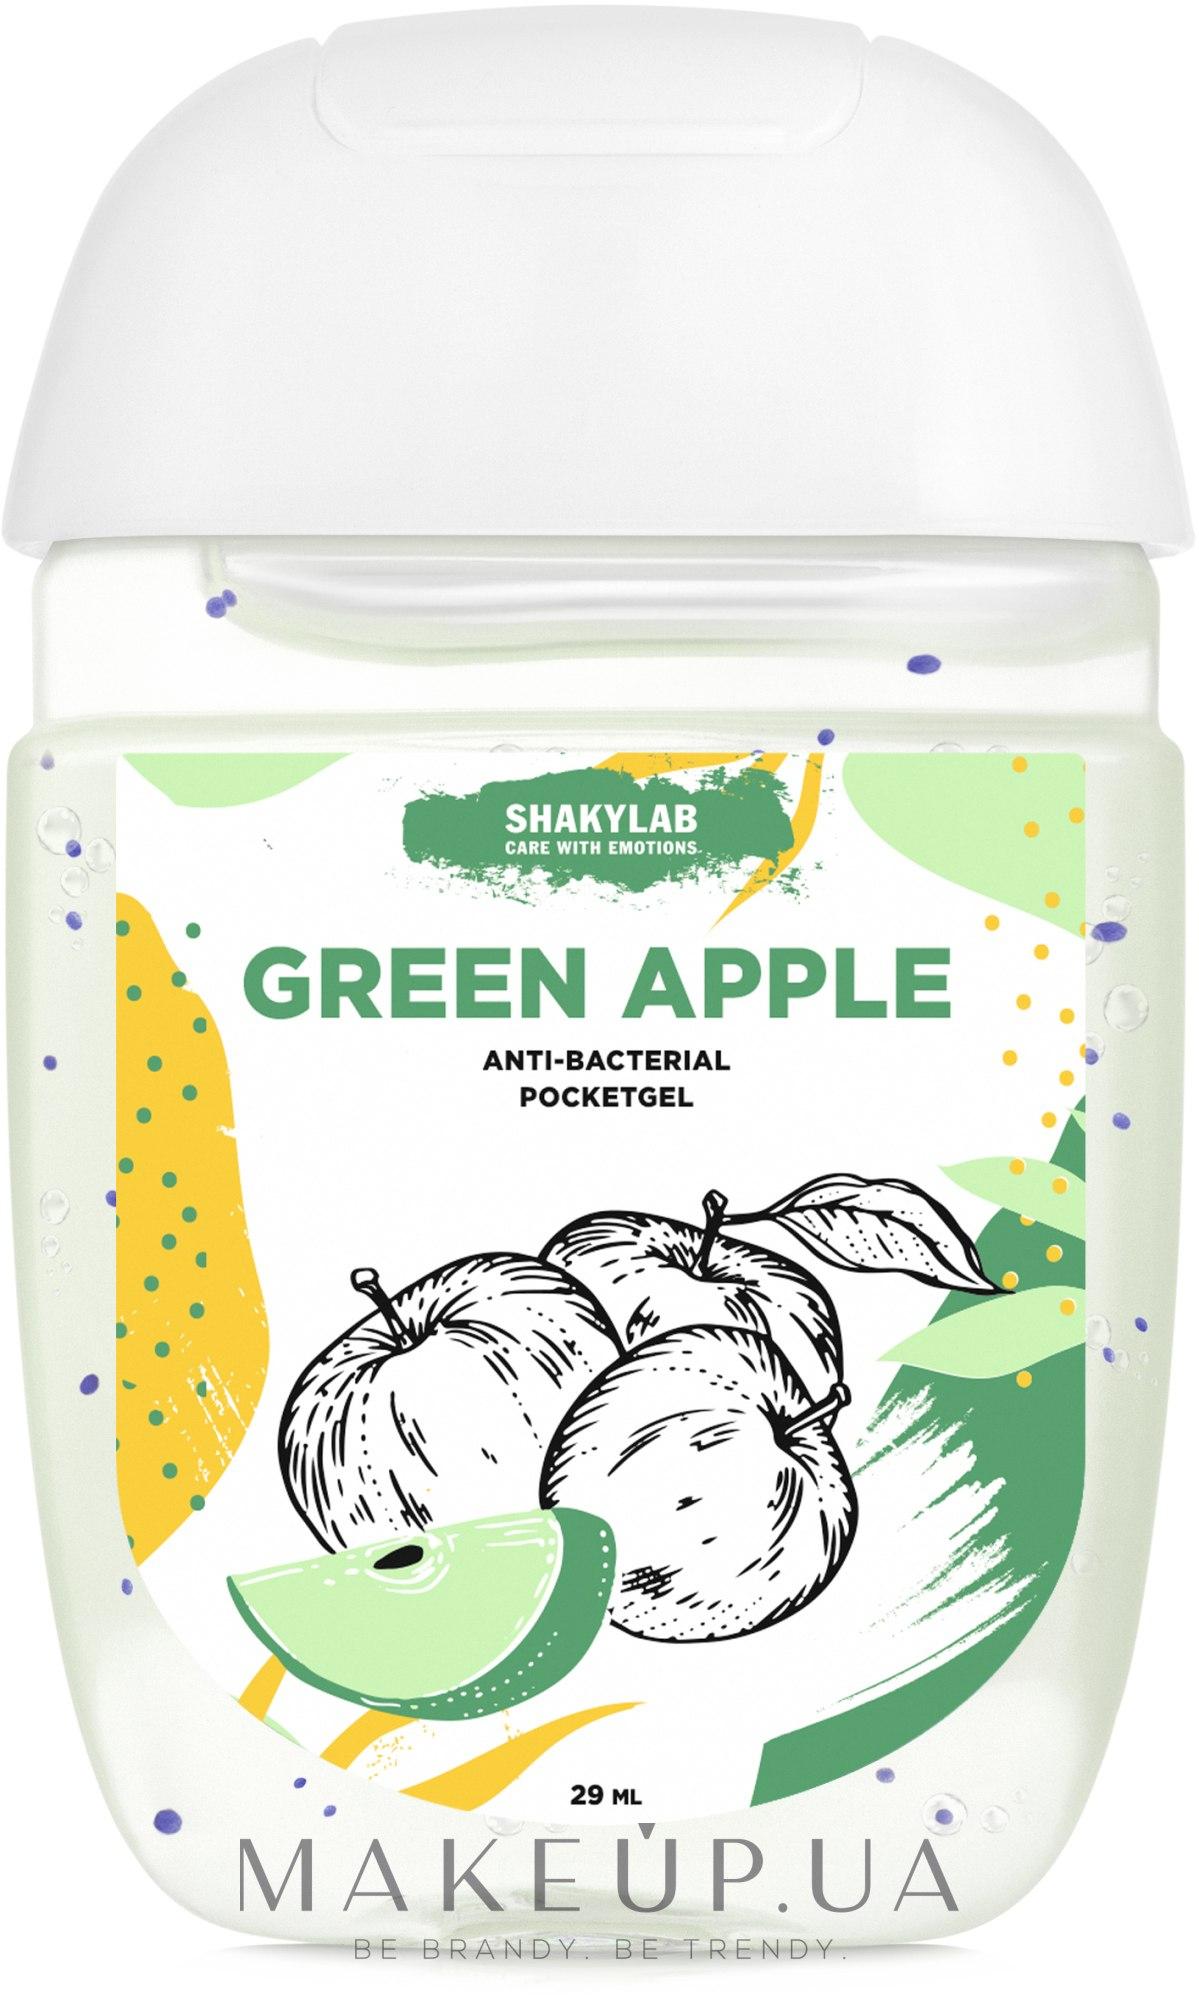 "Антибактериальный гель для рук ""Green apple"" - SHAKYLAB Anti-Bacterial Pocket Gel — фото 29ml"